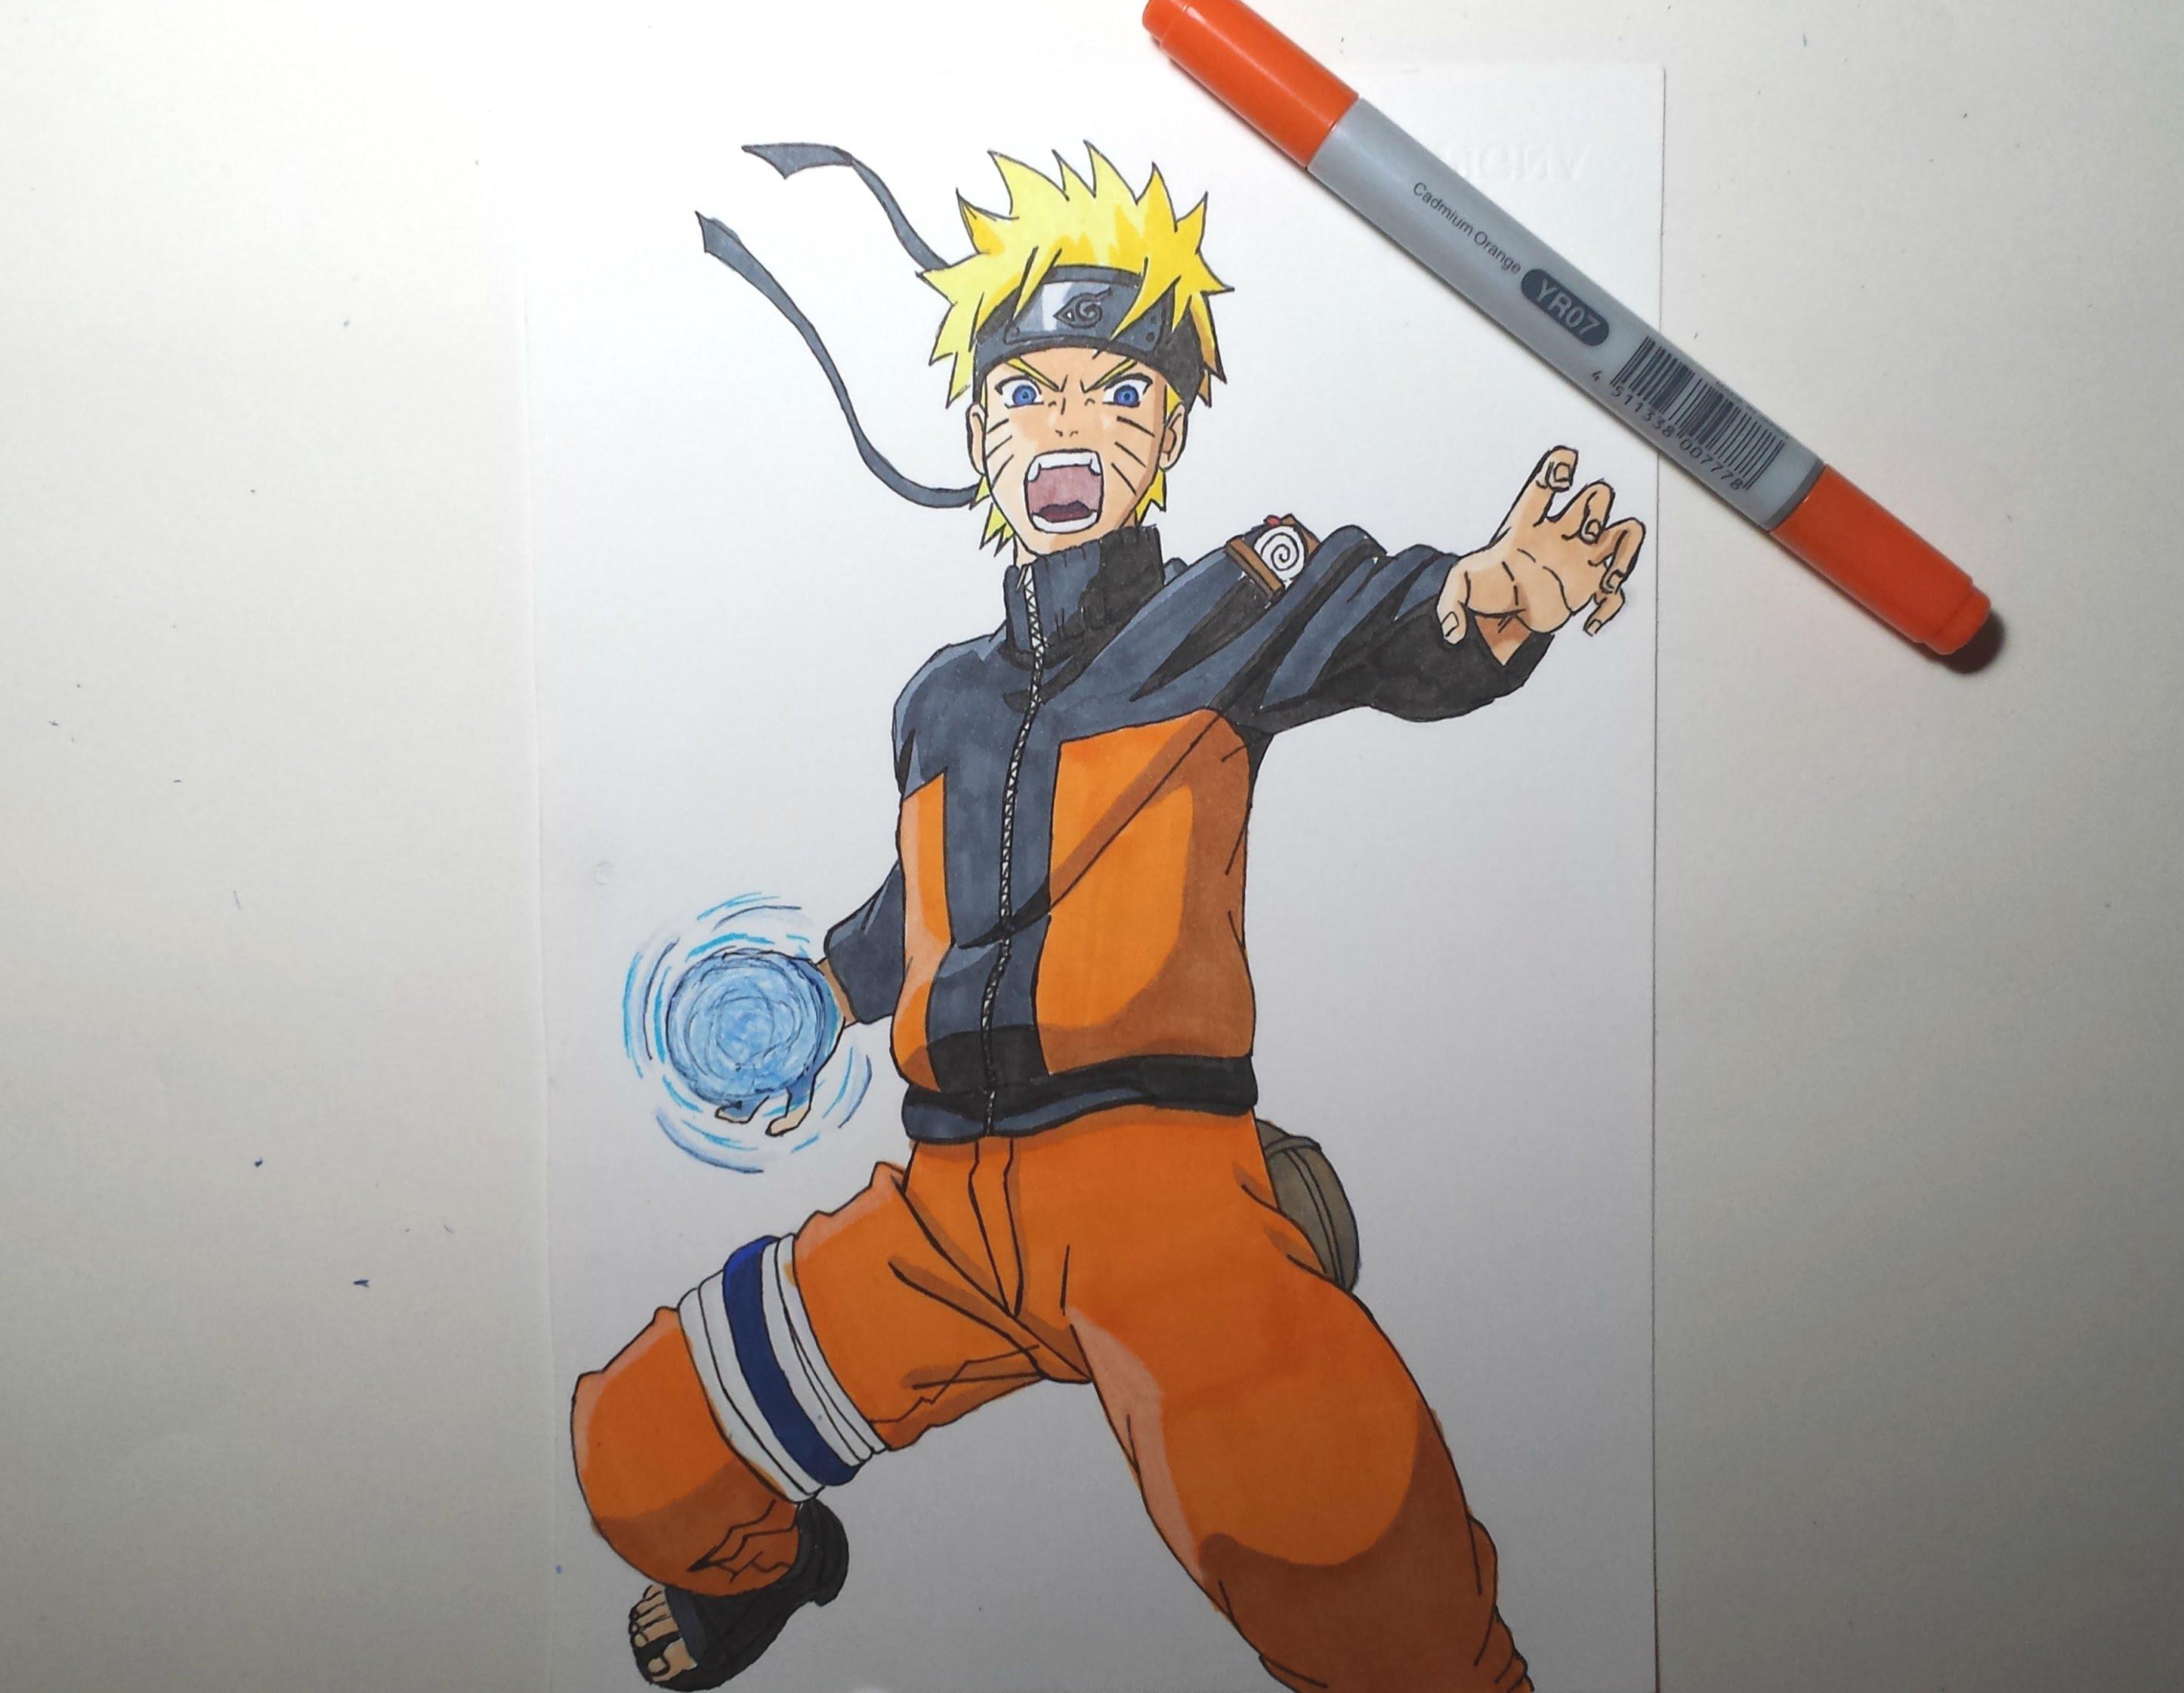 Drawn naruto naruto rasengan  ナルト螺旋丸 Naruto YouTube Speed